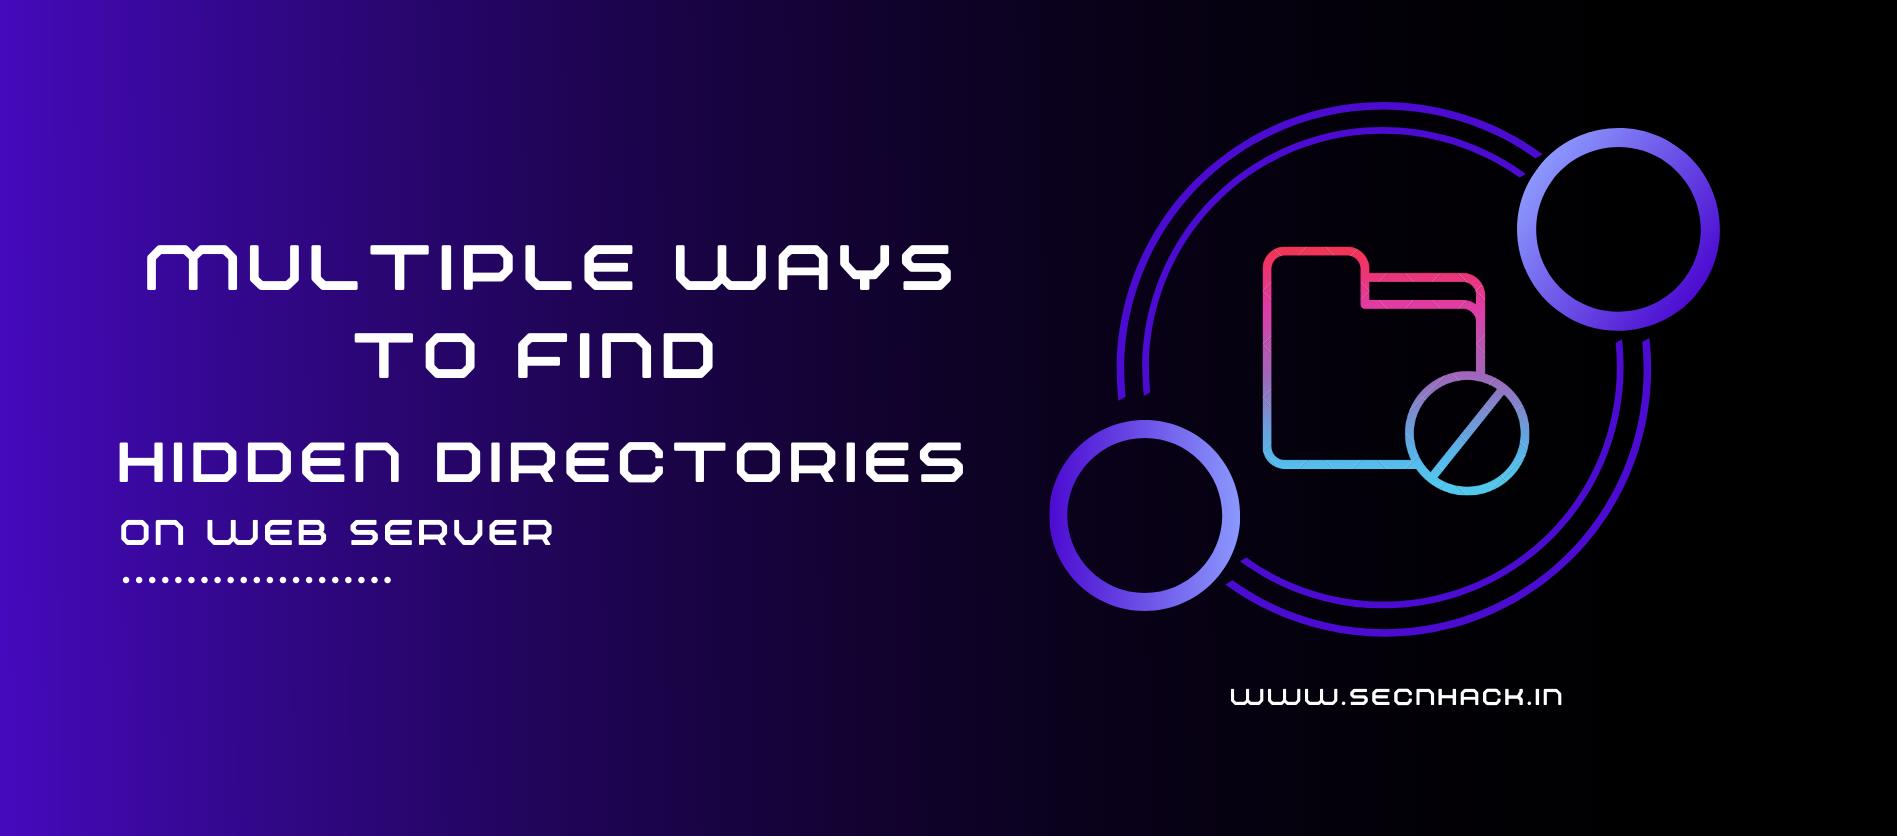 Multiple Ways to Find Hidden Directory on Web Server